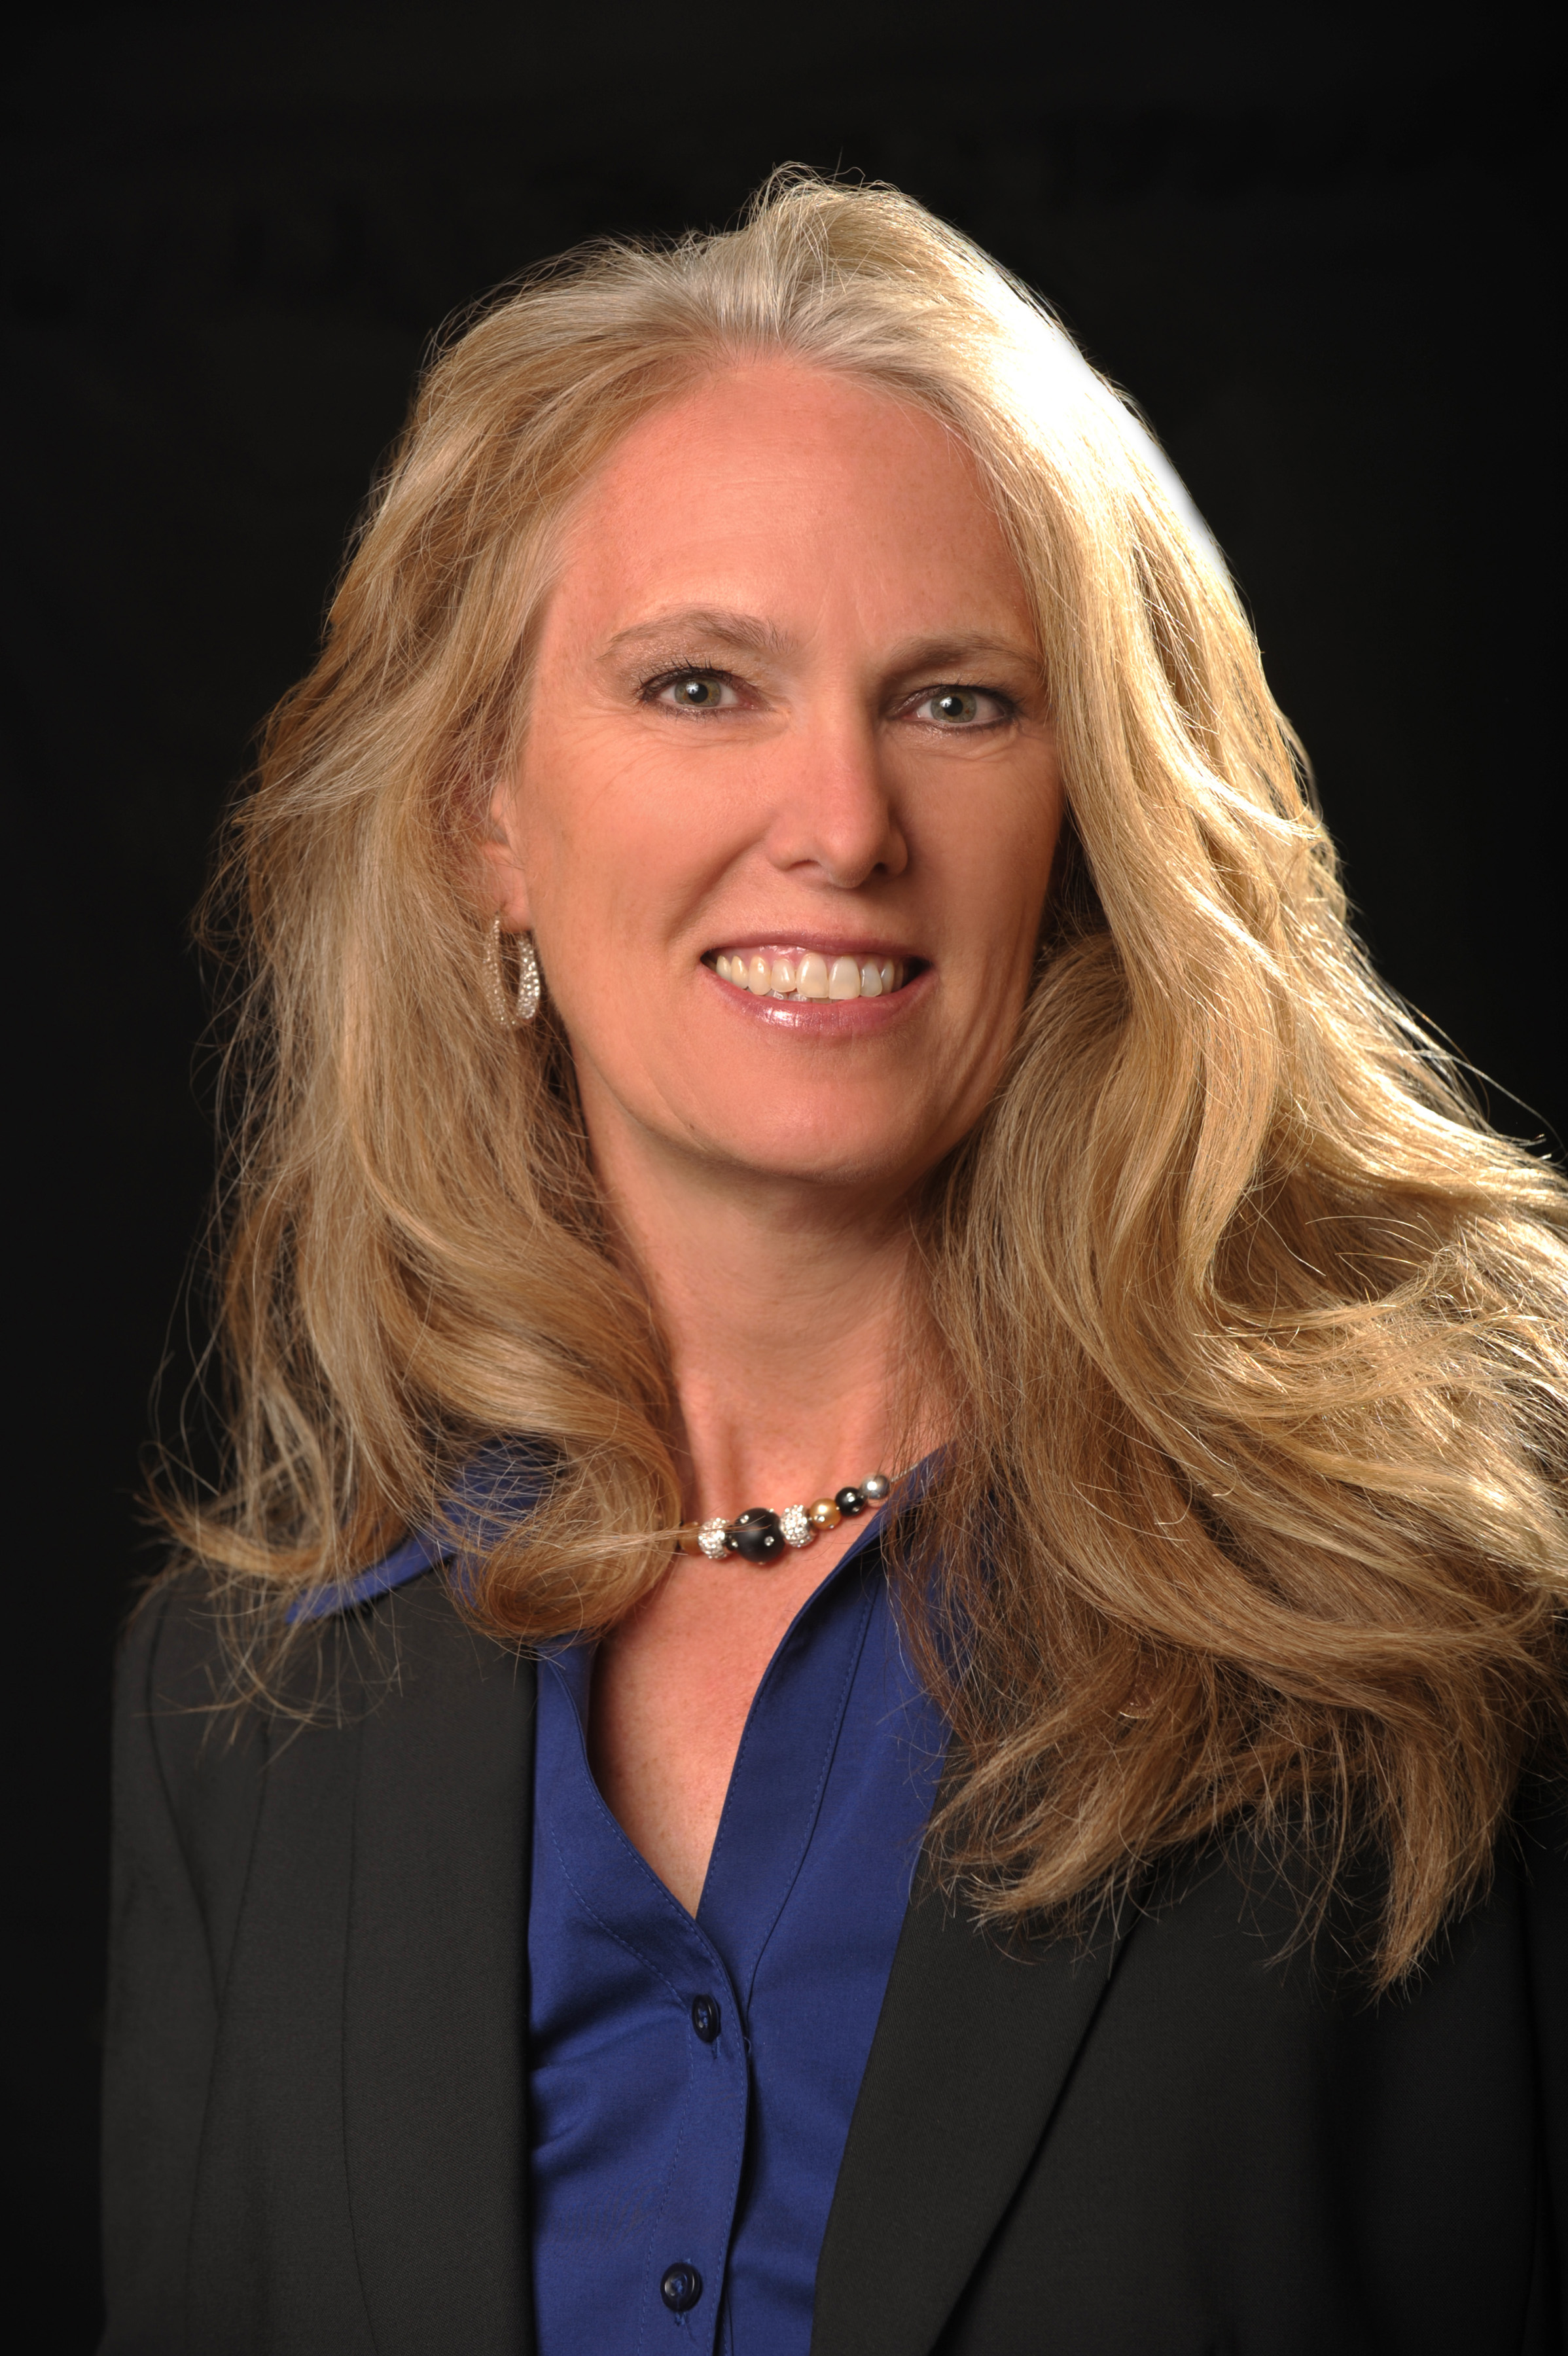 Dr. Kathy Snider